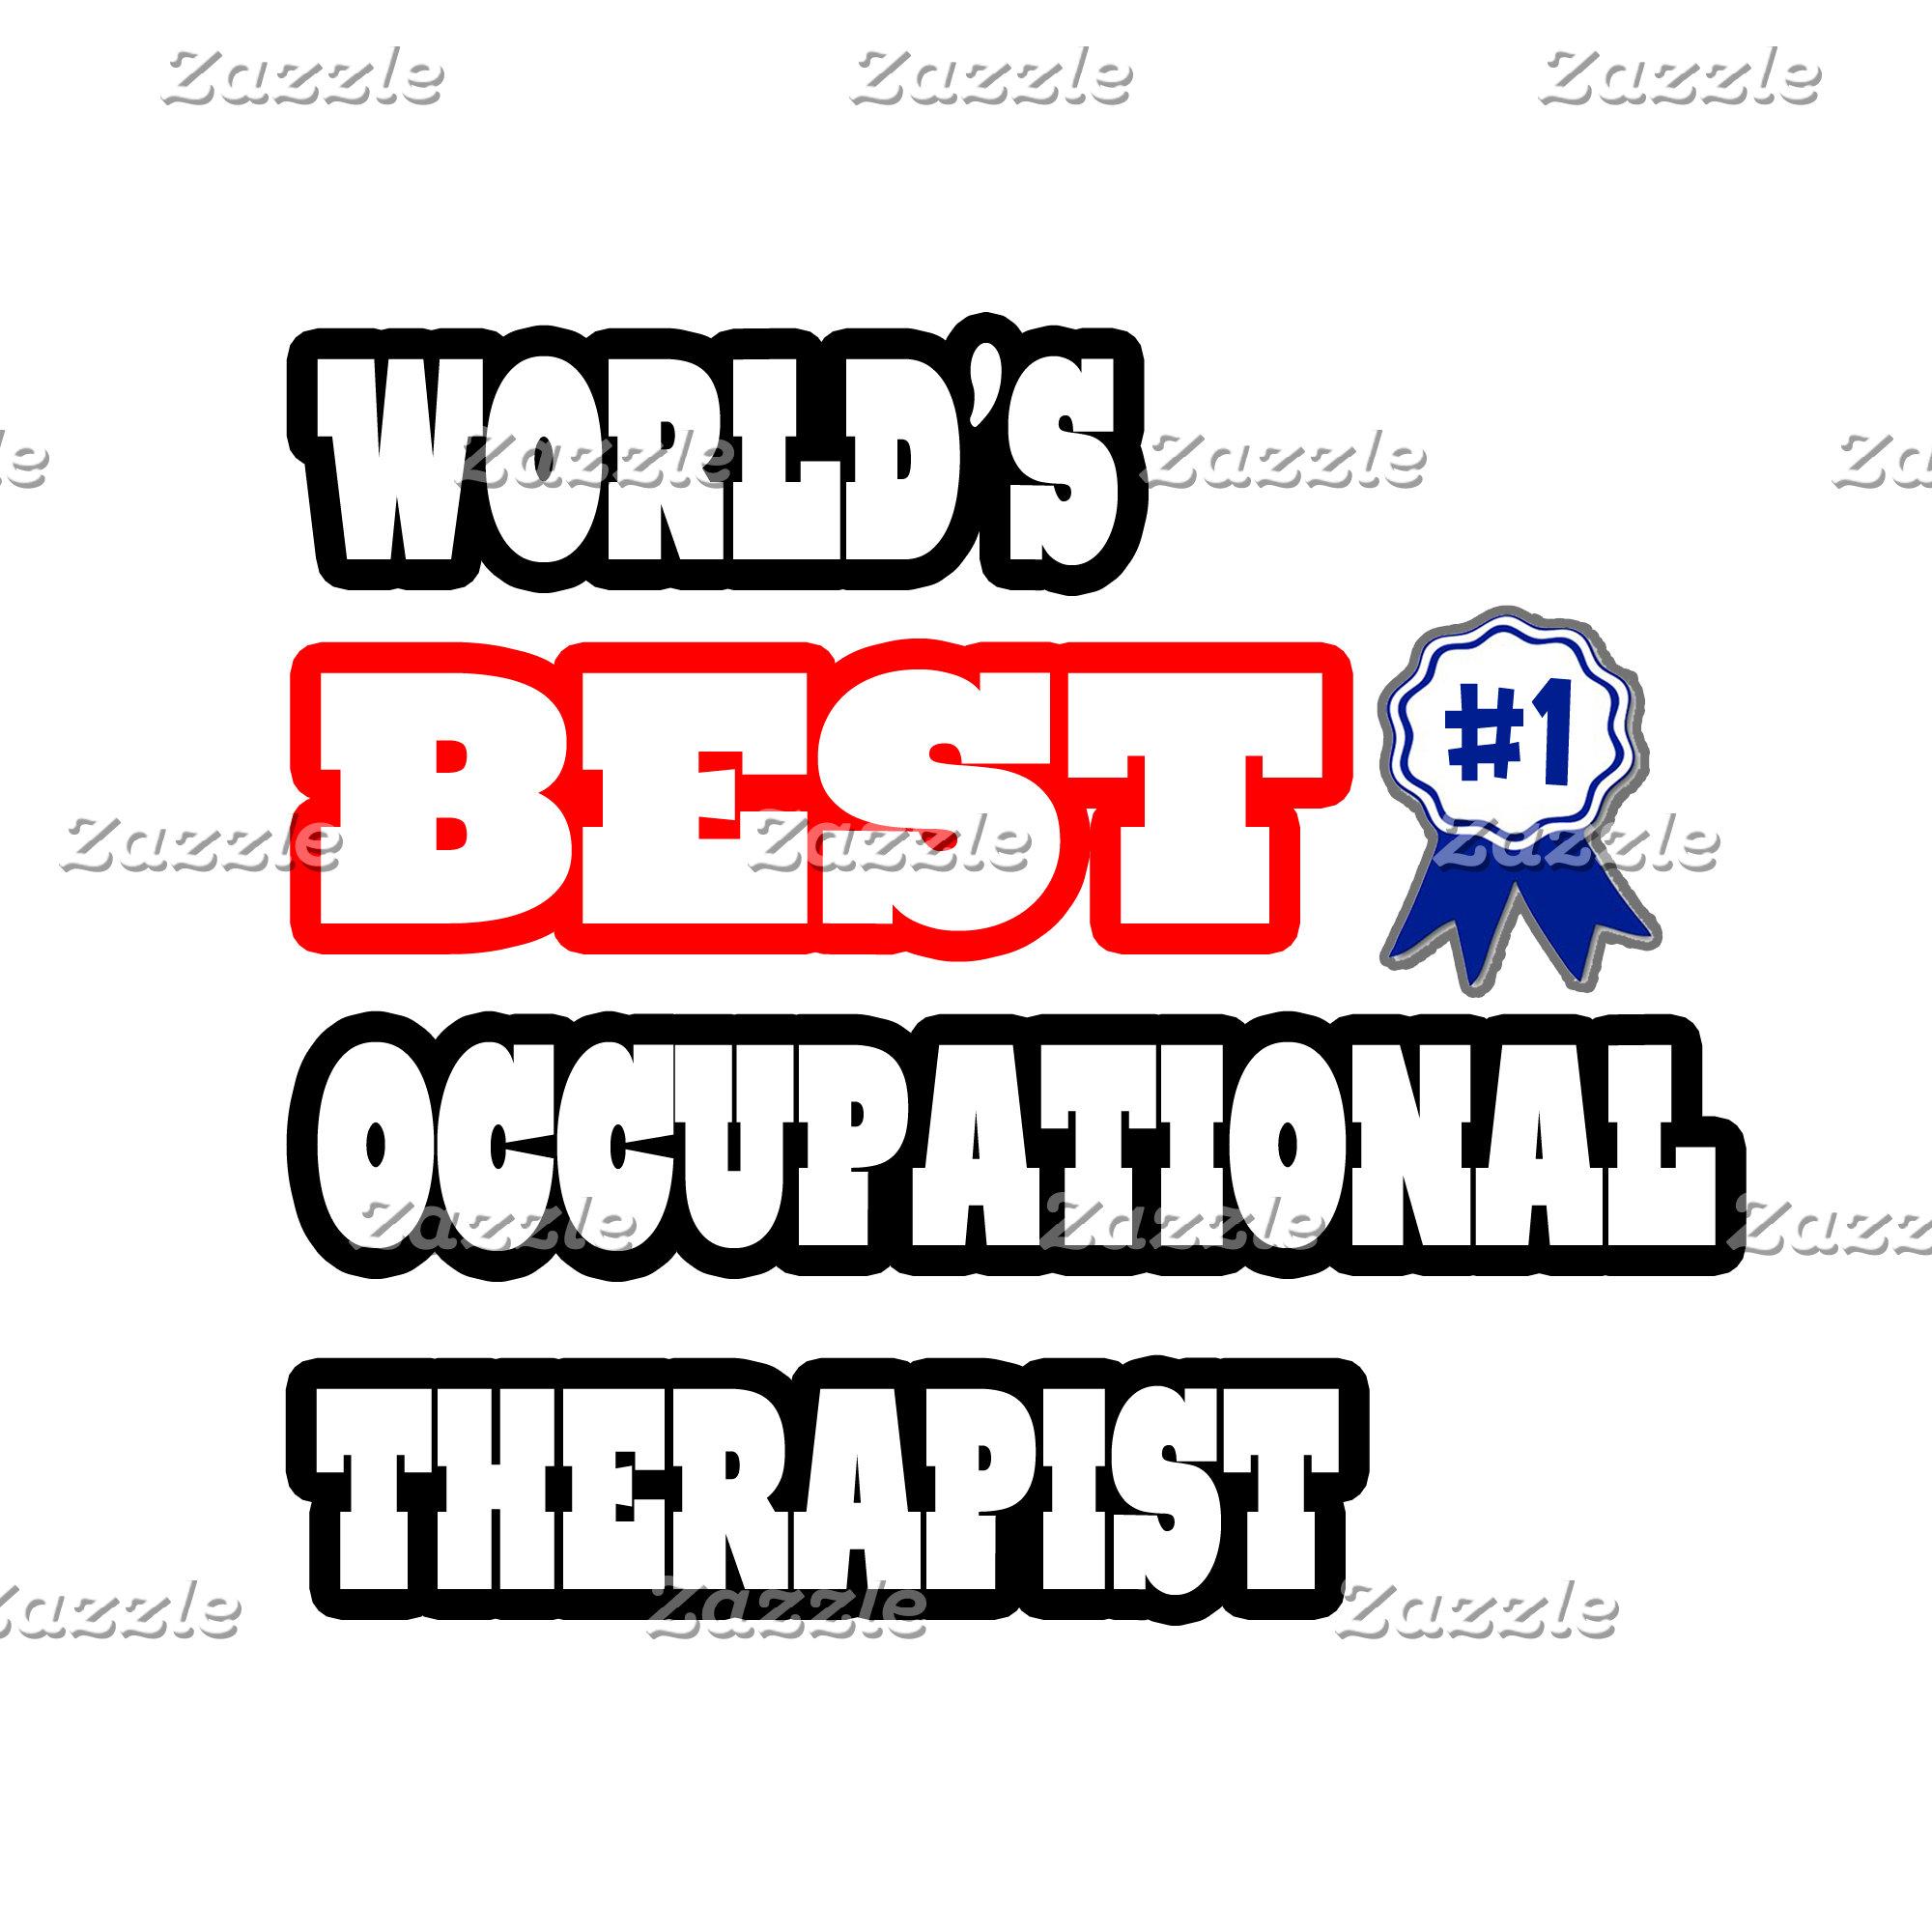 World's Best Occupational Therapist